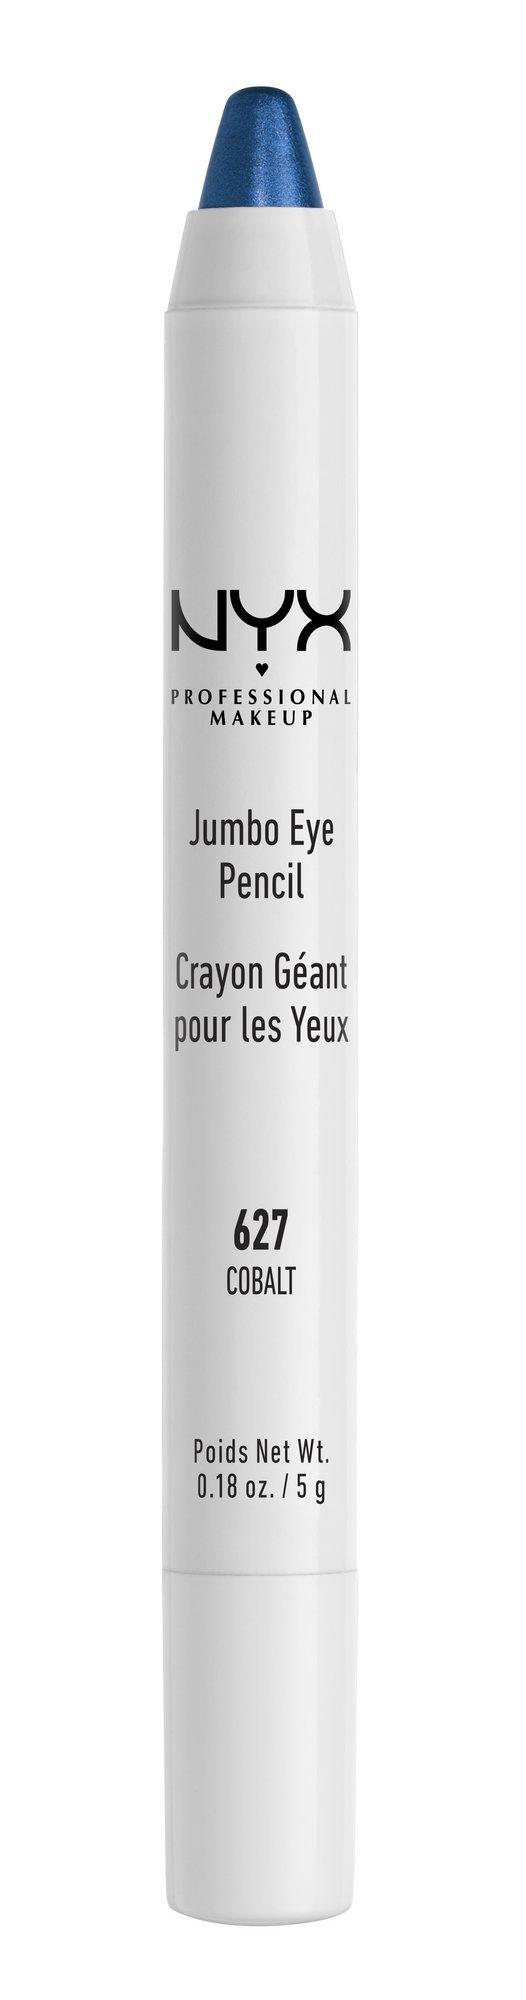 NYX PROFESSIONAL MAKEUP Jumbo Eye Pencil, Cobalt, 0.18 Ounce